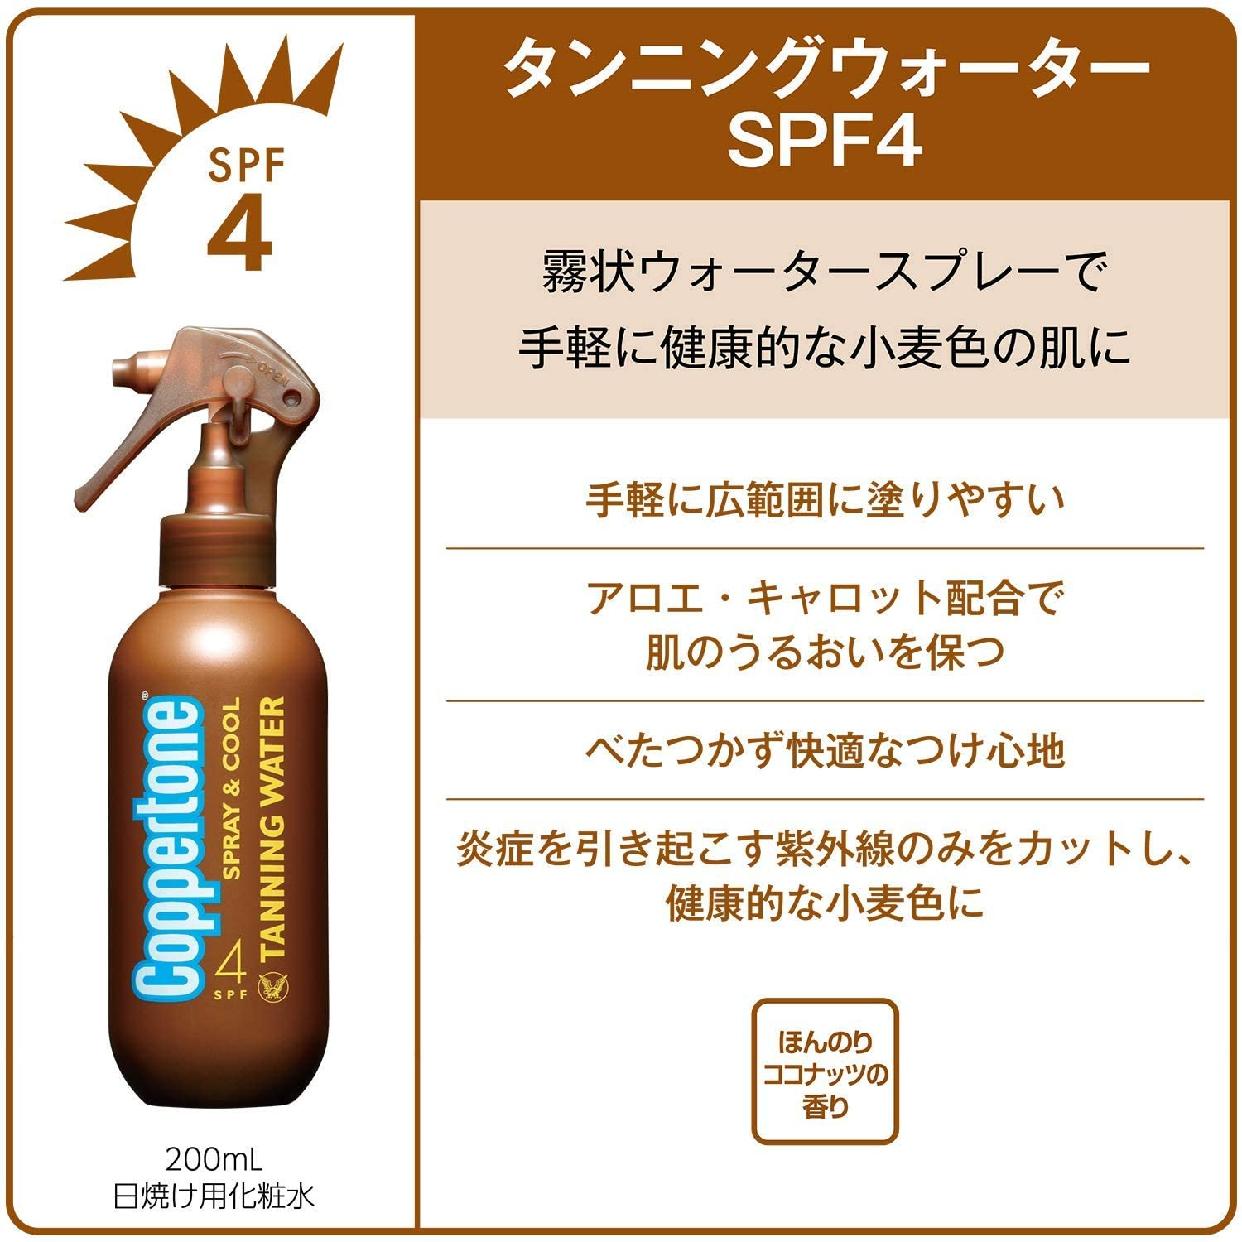 Coppertone(コパトーン)コパトーンタンニングウォーター SPF2の商品画像4